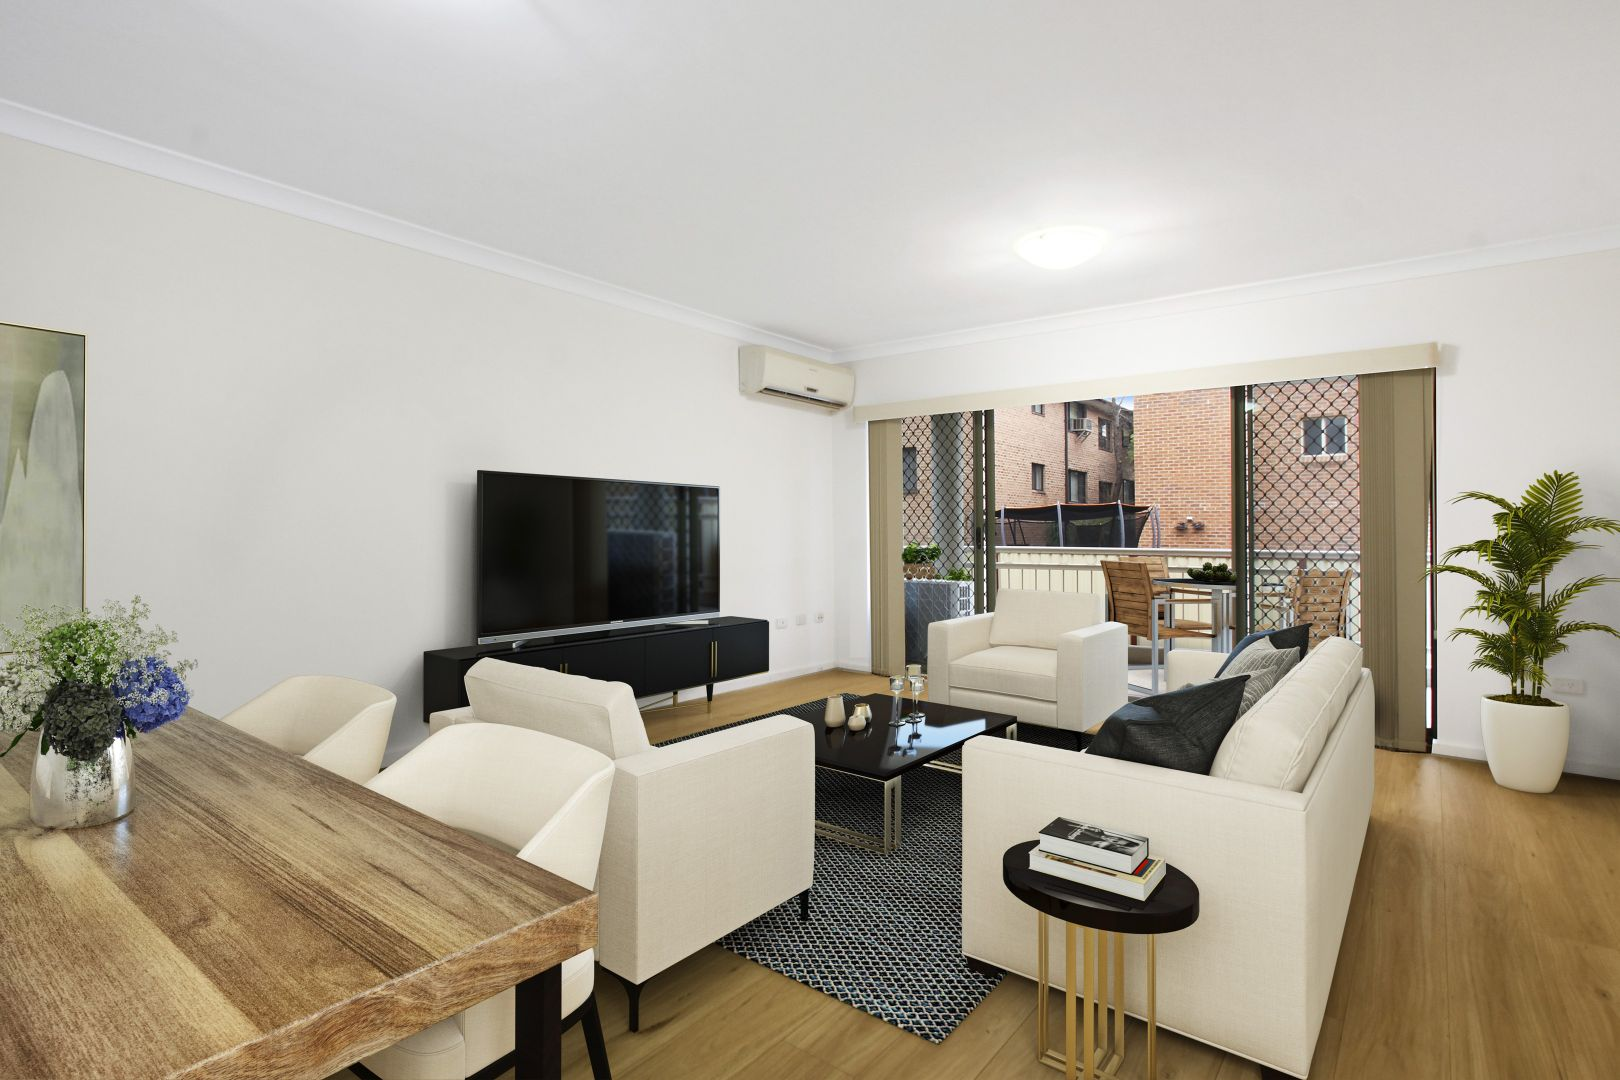 2/12-14 Betts Street, Parramatta NSW 2150, Image 2